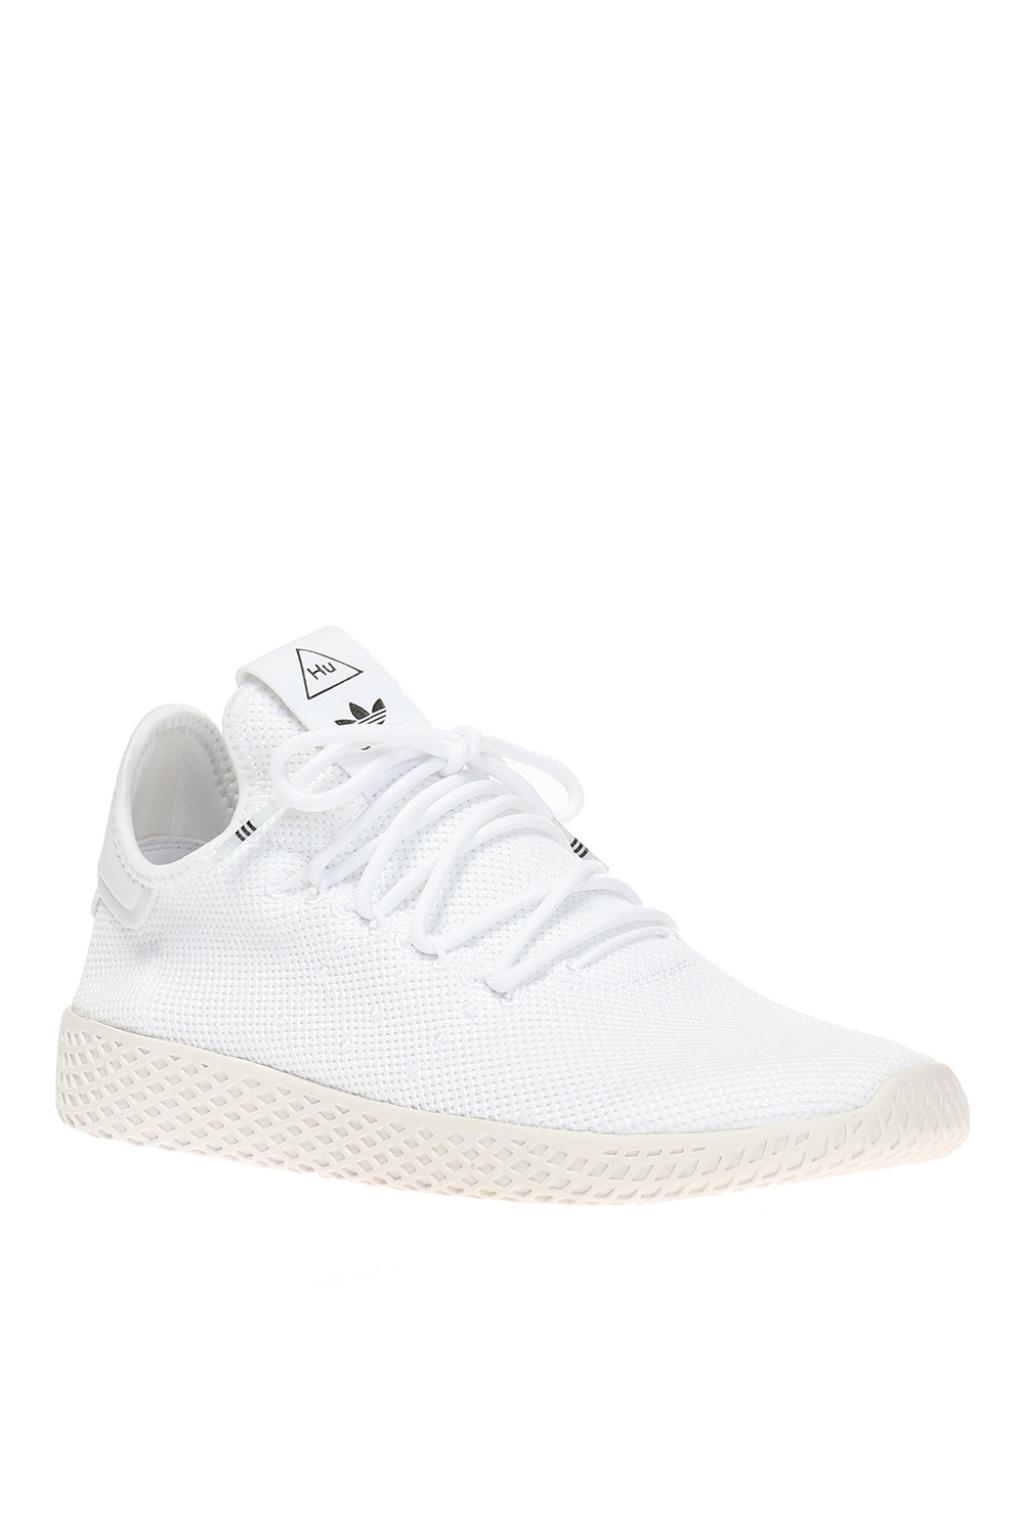 38dfcfc63 Adidas Originals - White X Pharell Williams for Men - Lyst. View fullscreen